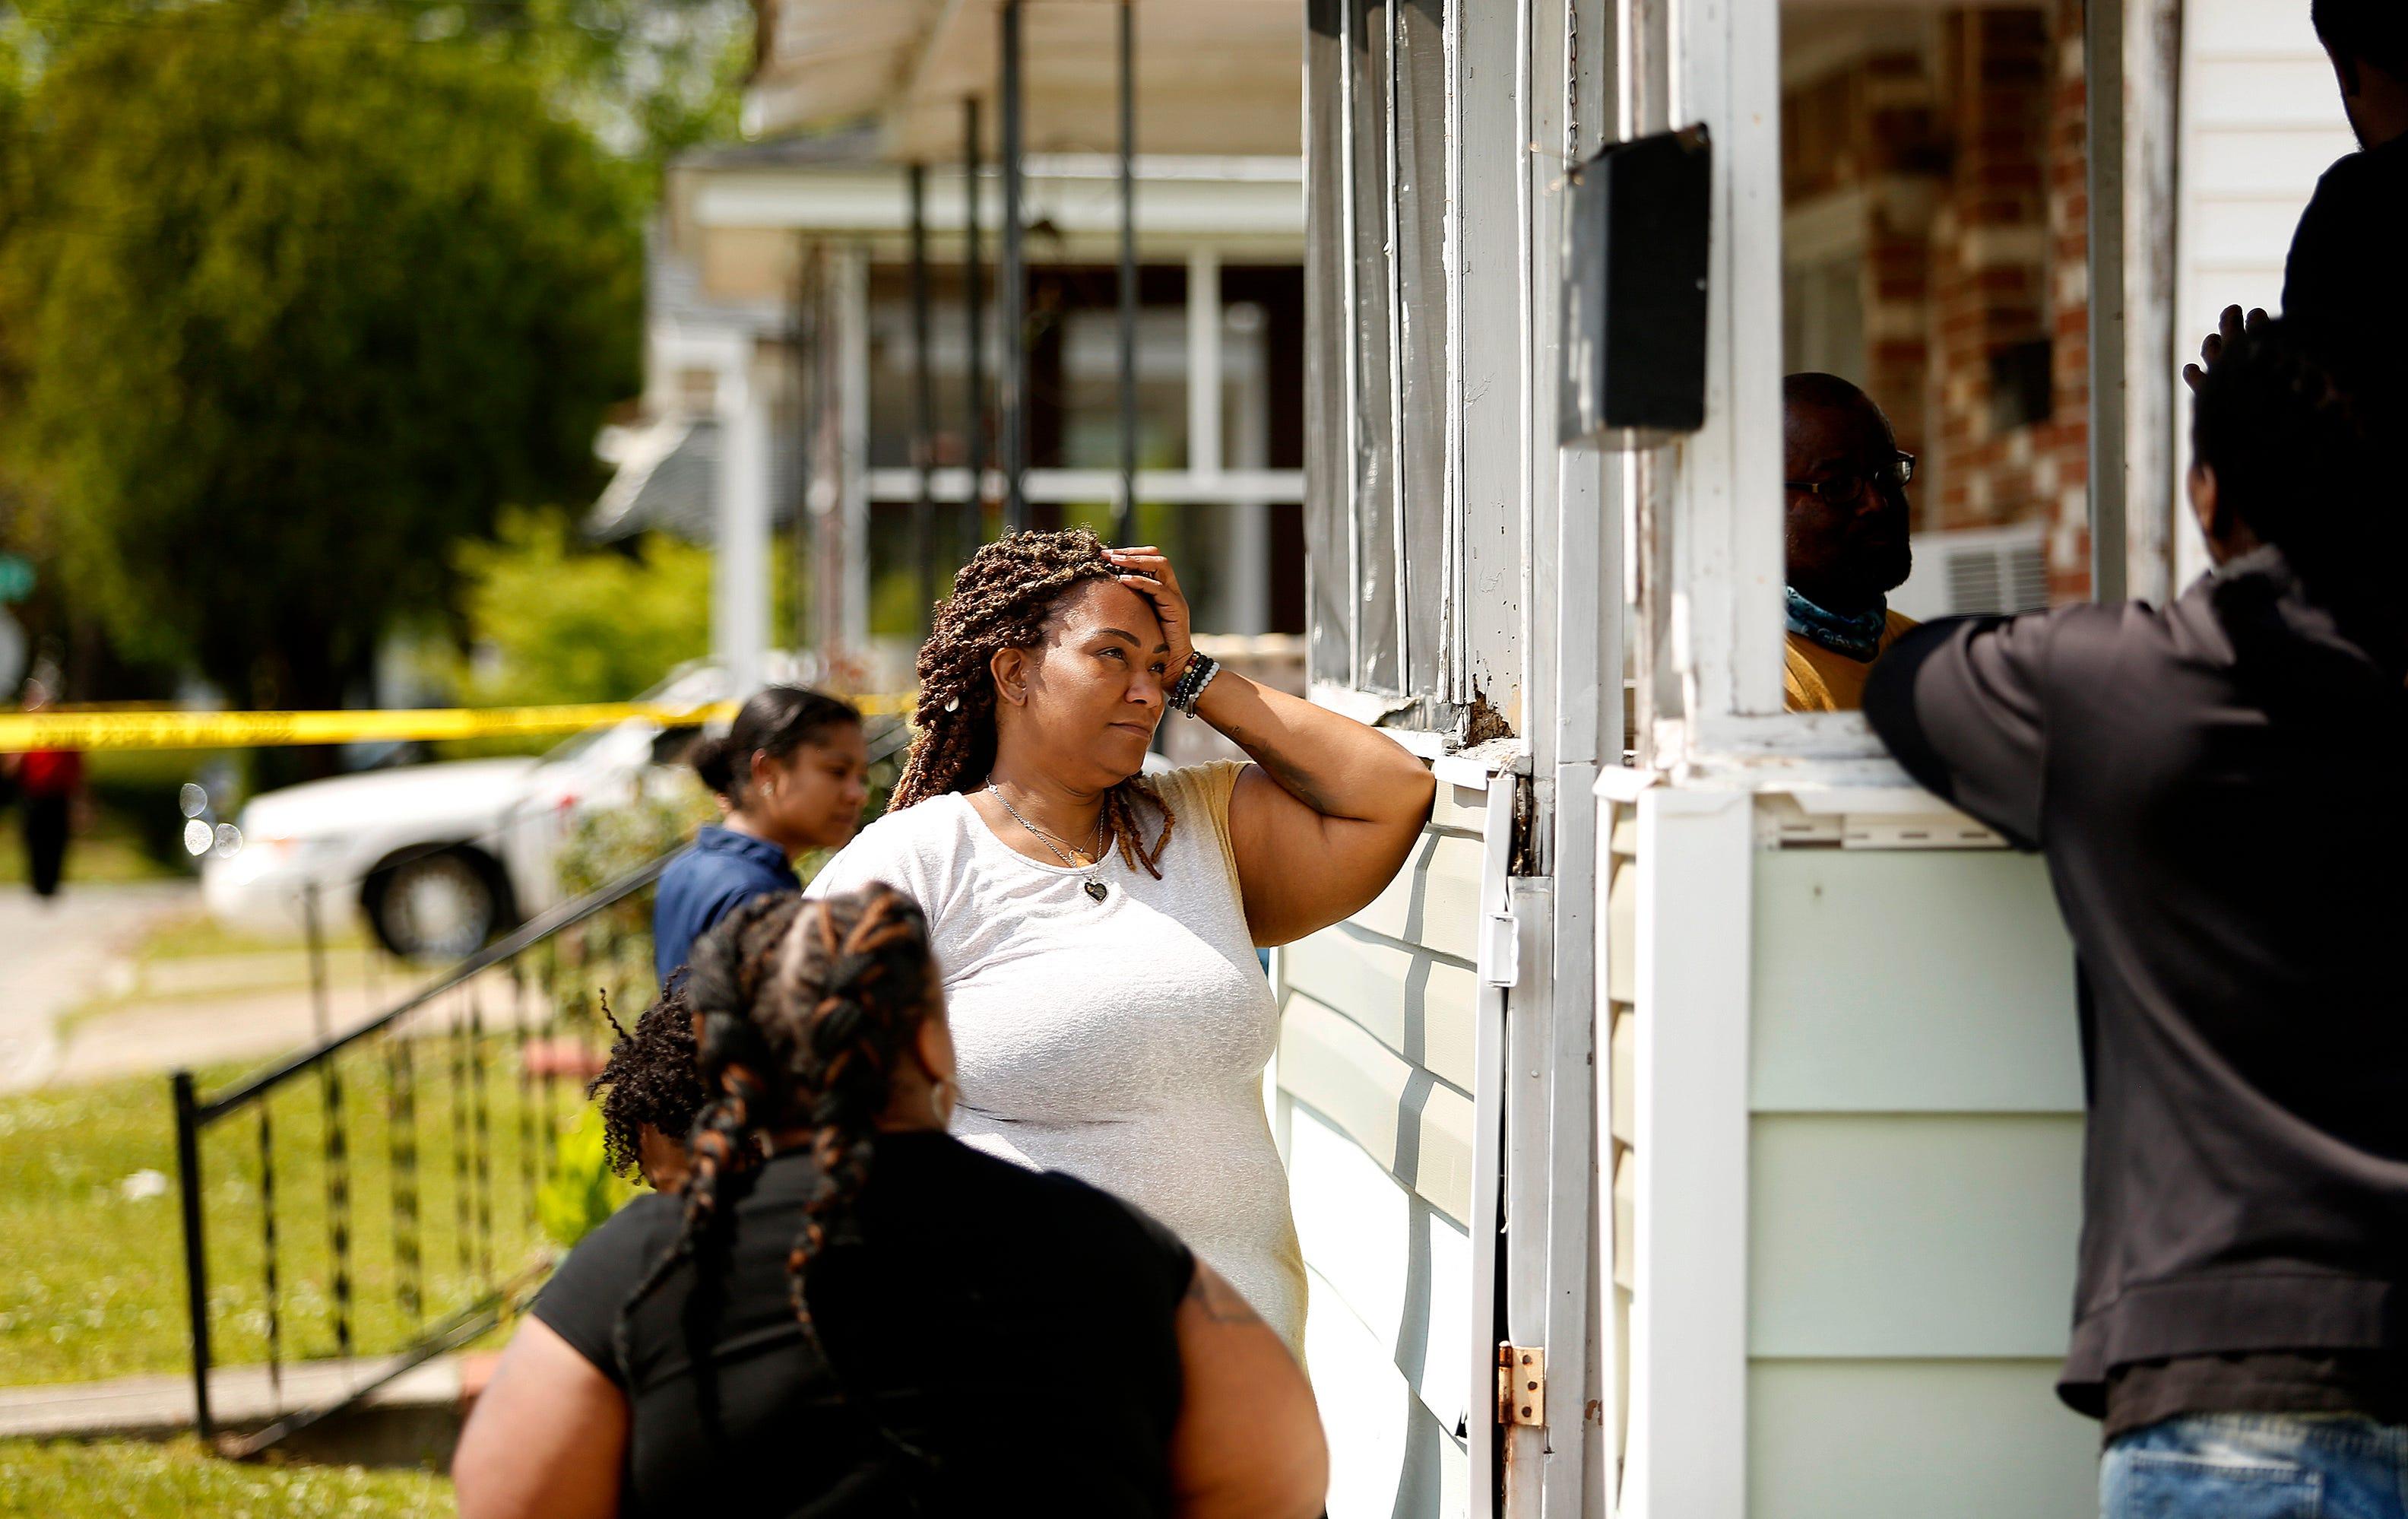 Sheriff: Deputy fatally shot Black man while serving warrant 1